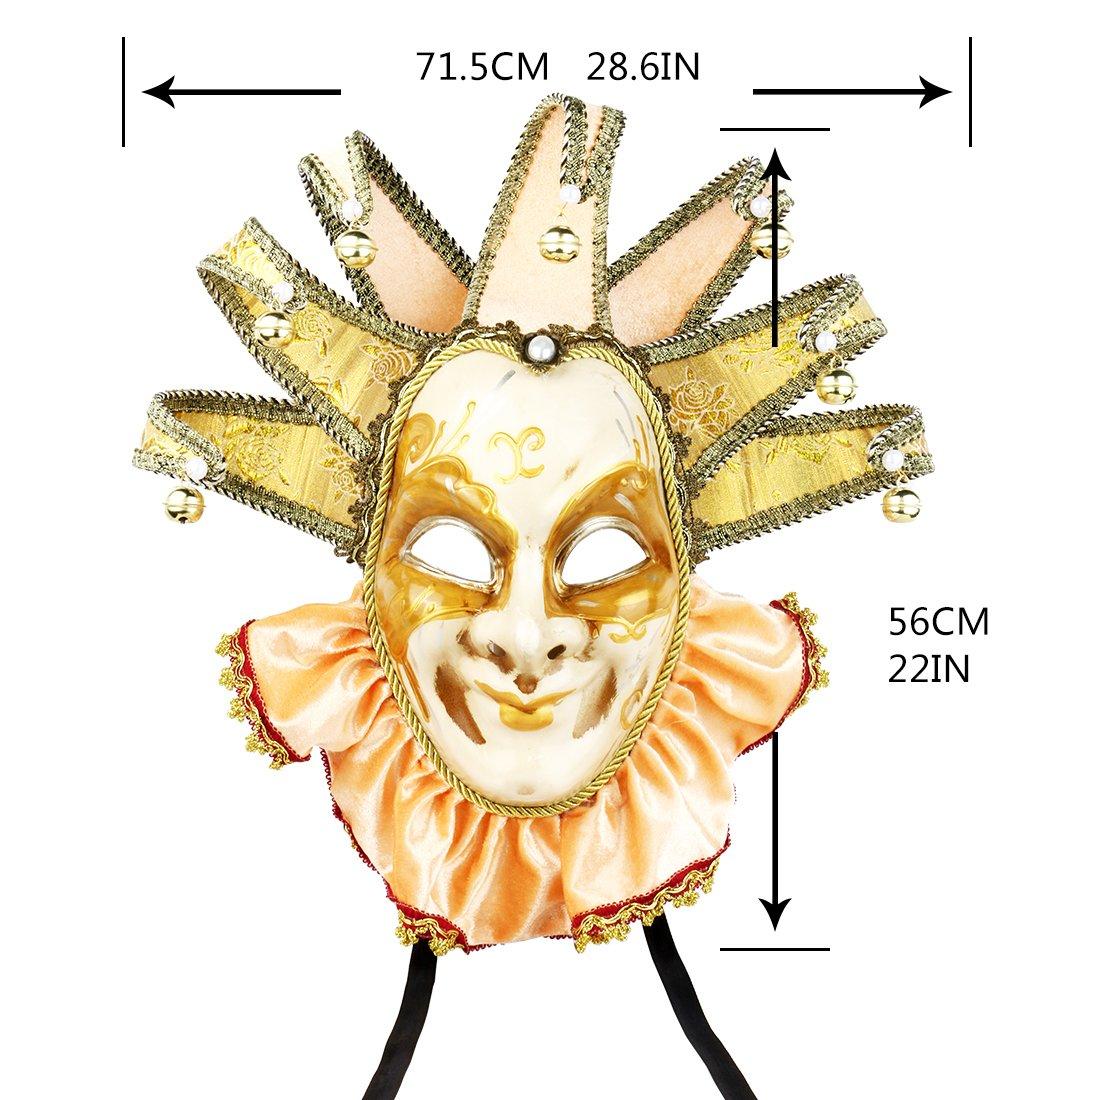 Amazon.com: Smiling Gold Jester Jolly Veneice Joker Mask Venetian ...